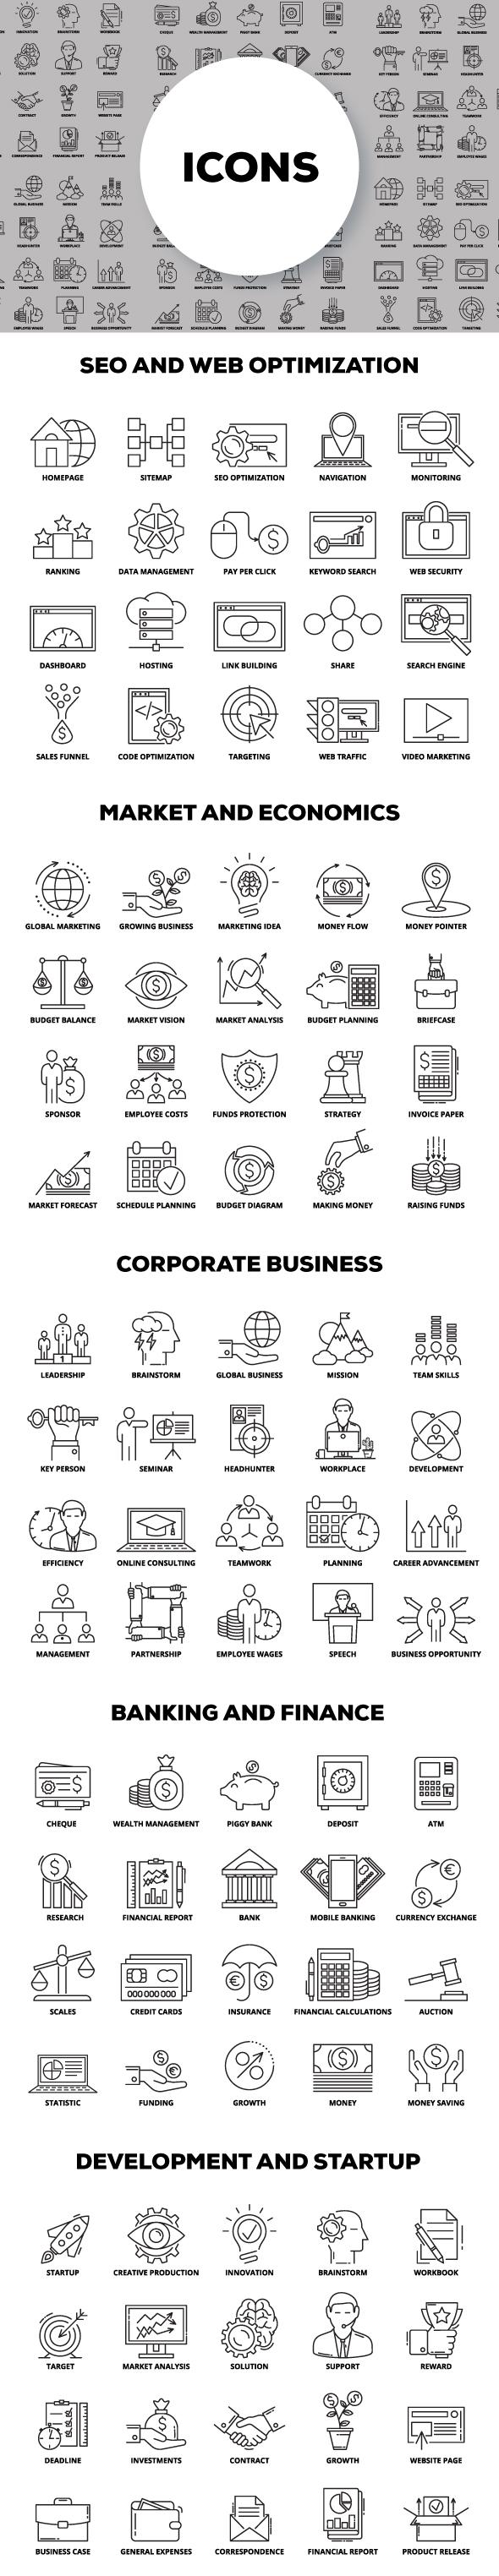 Multipurpose Infographics PowerPoint Templates v.5.0 - 176